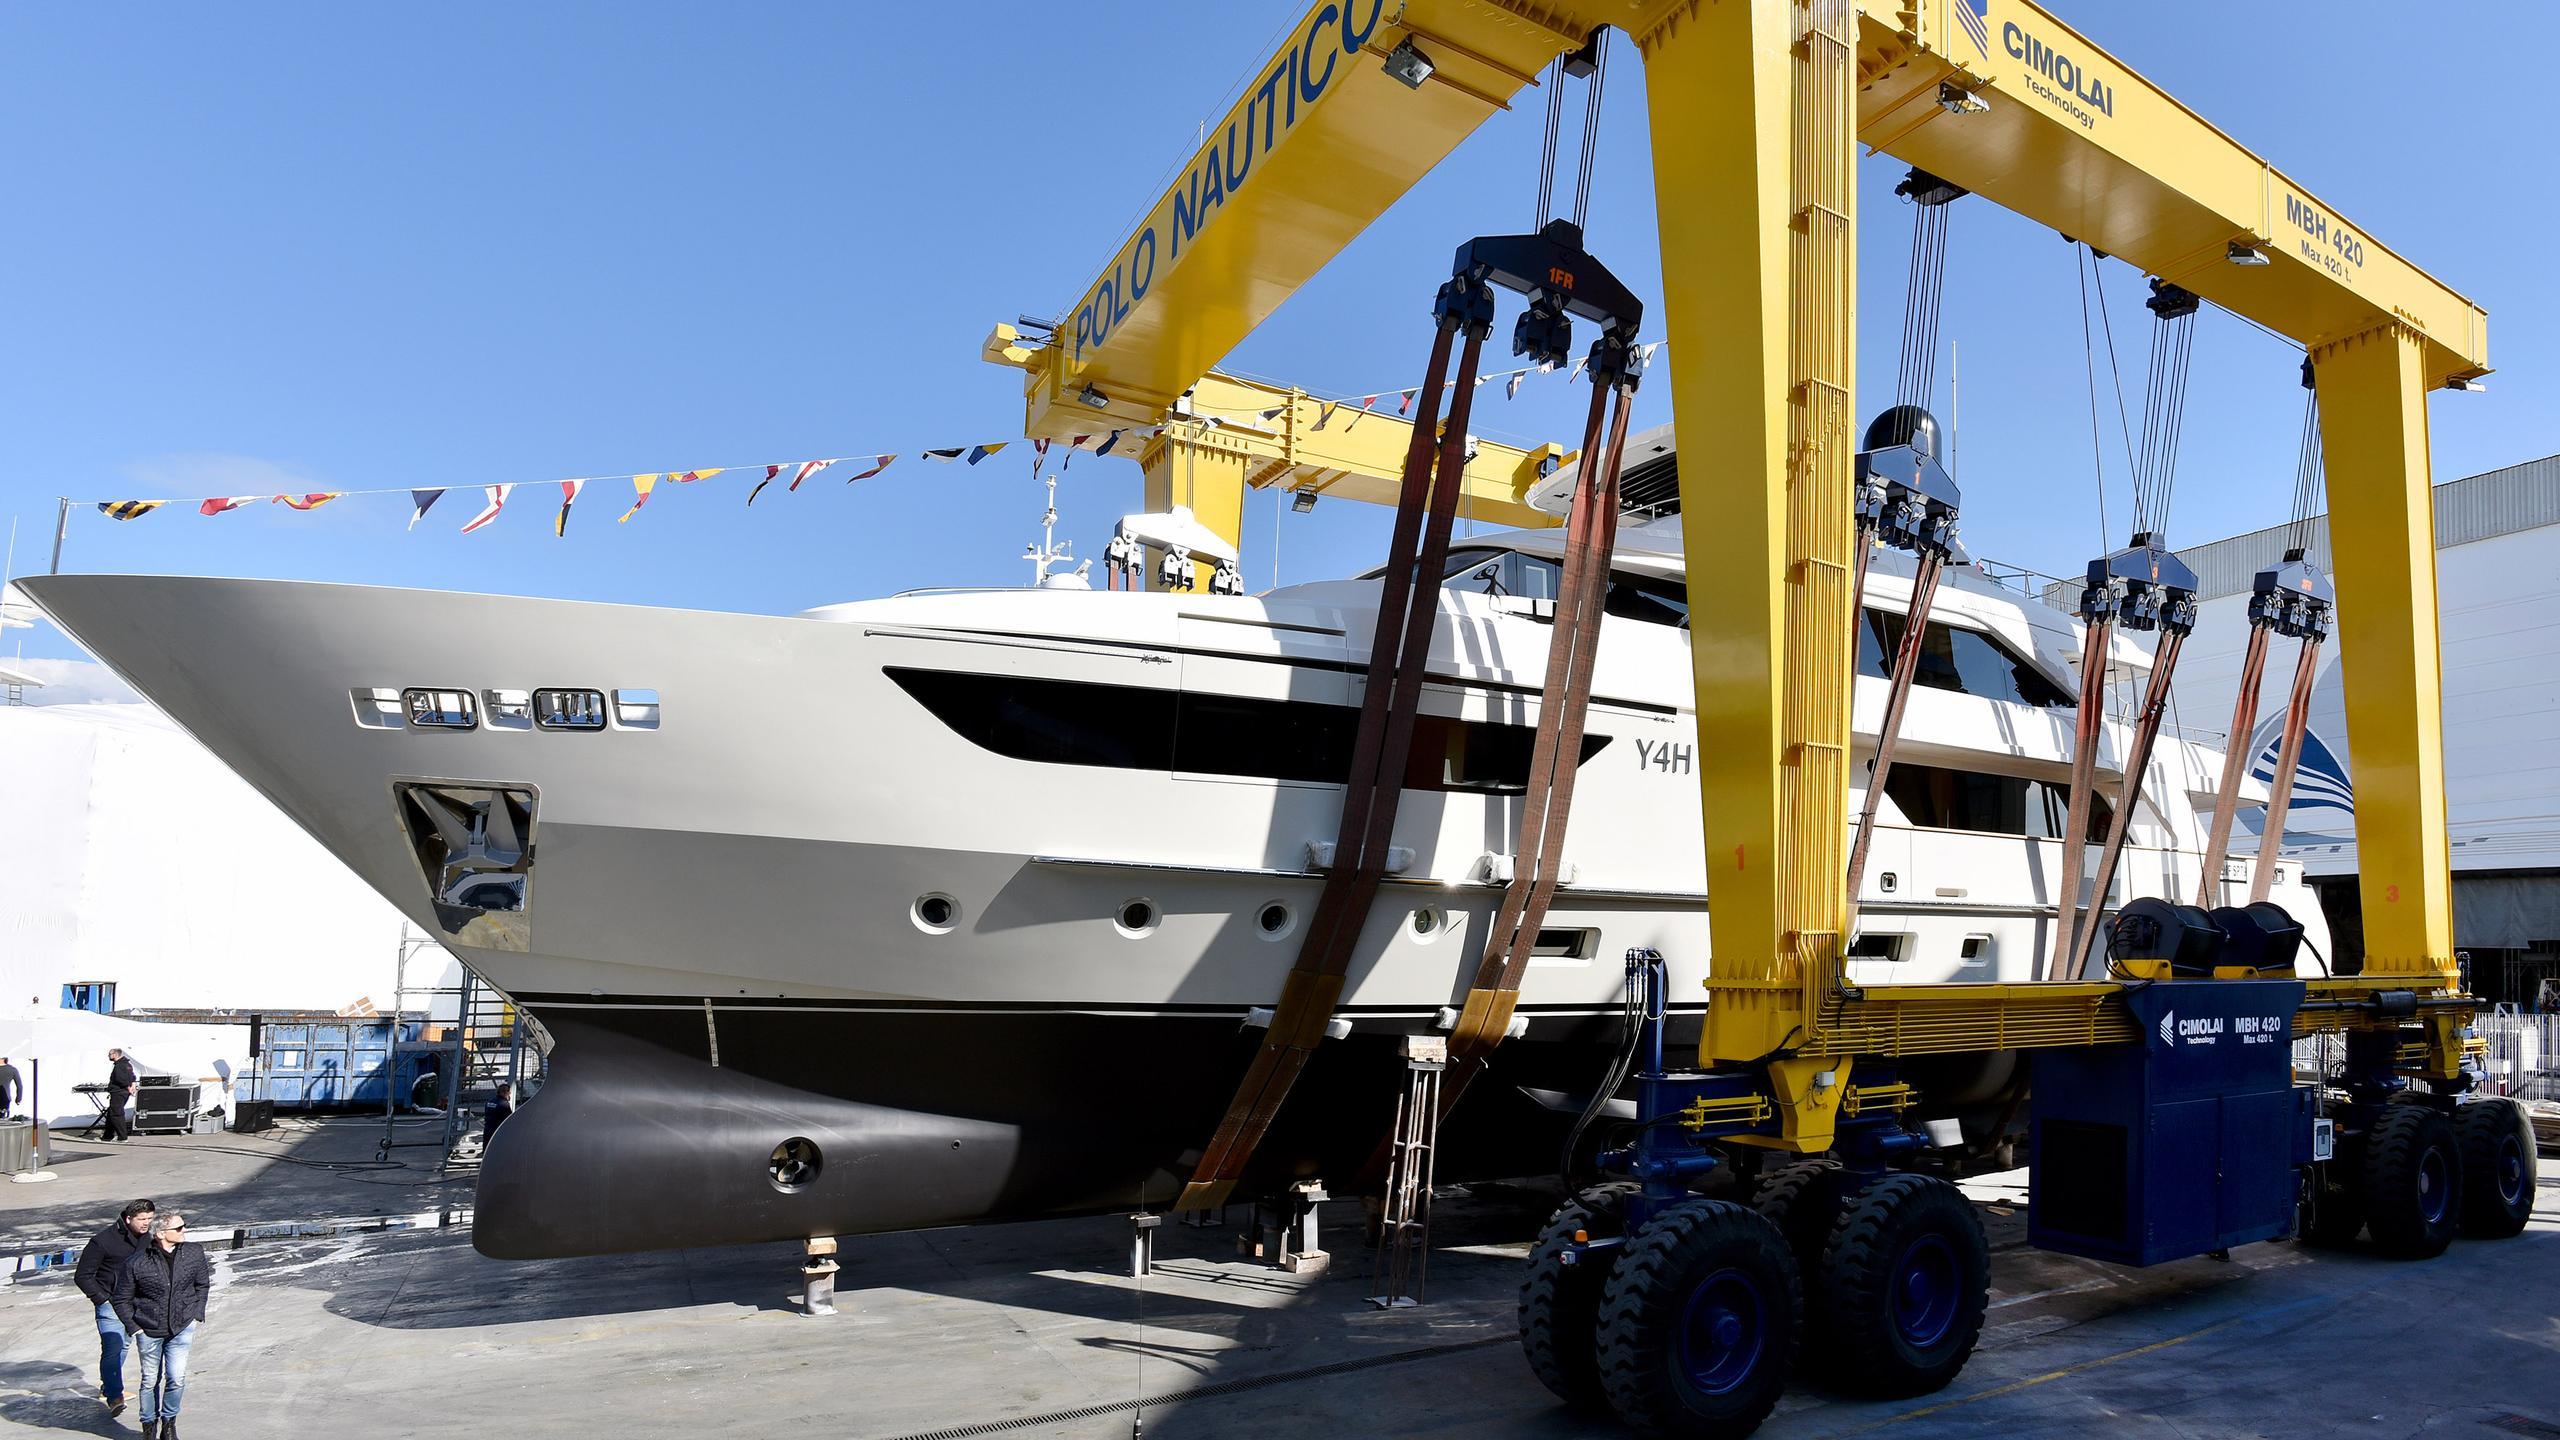 y4h motoryacht sanlorenzo sd126 38m 2017 launch